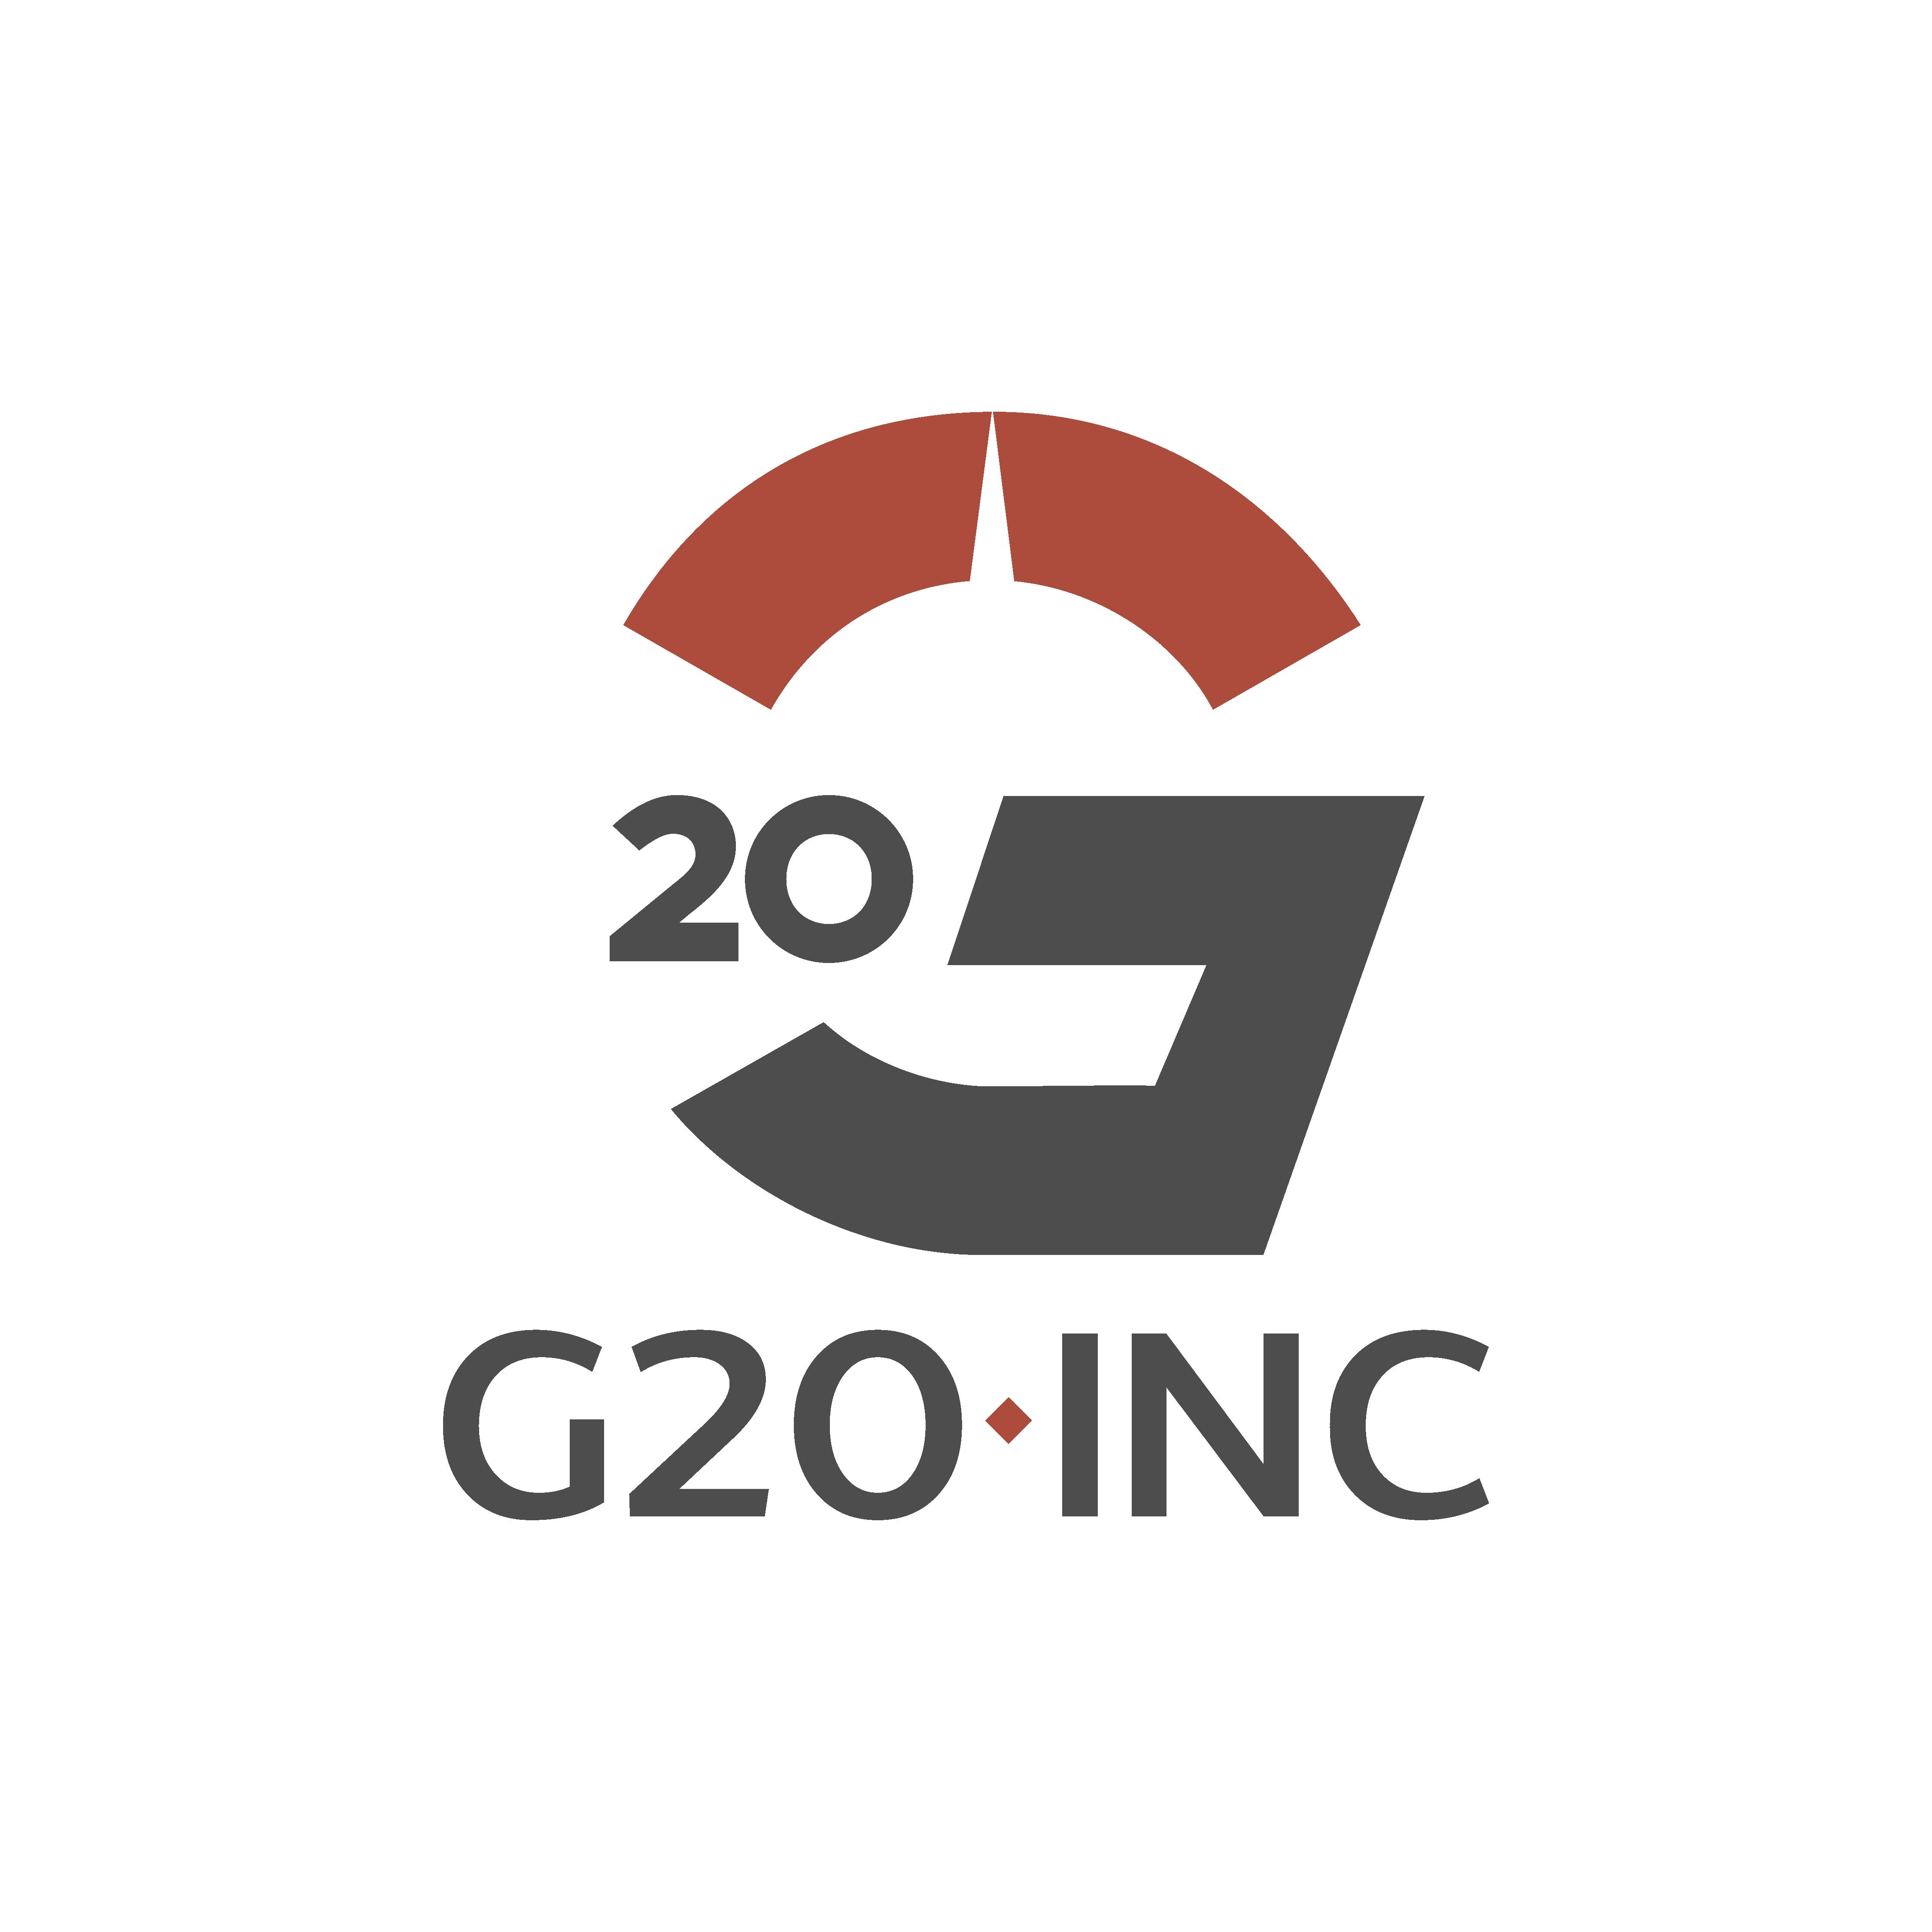 G20 INC